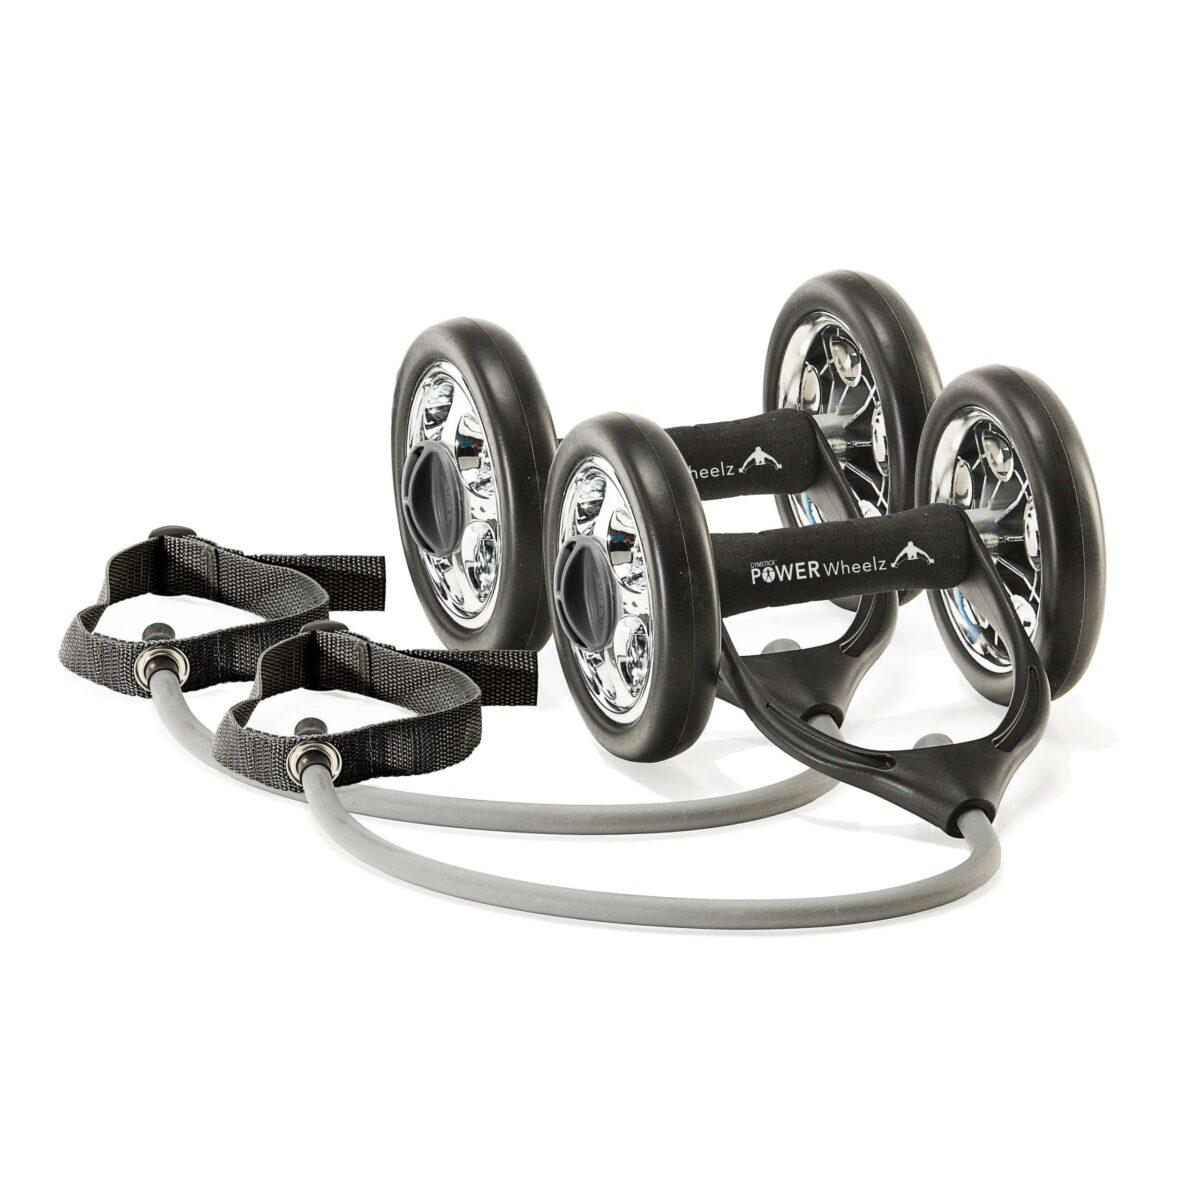 Gymstick Power Wheelz Pro - Fitnessgeräte - Gymstick